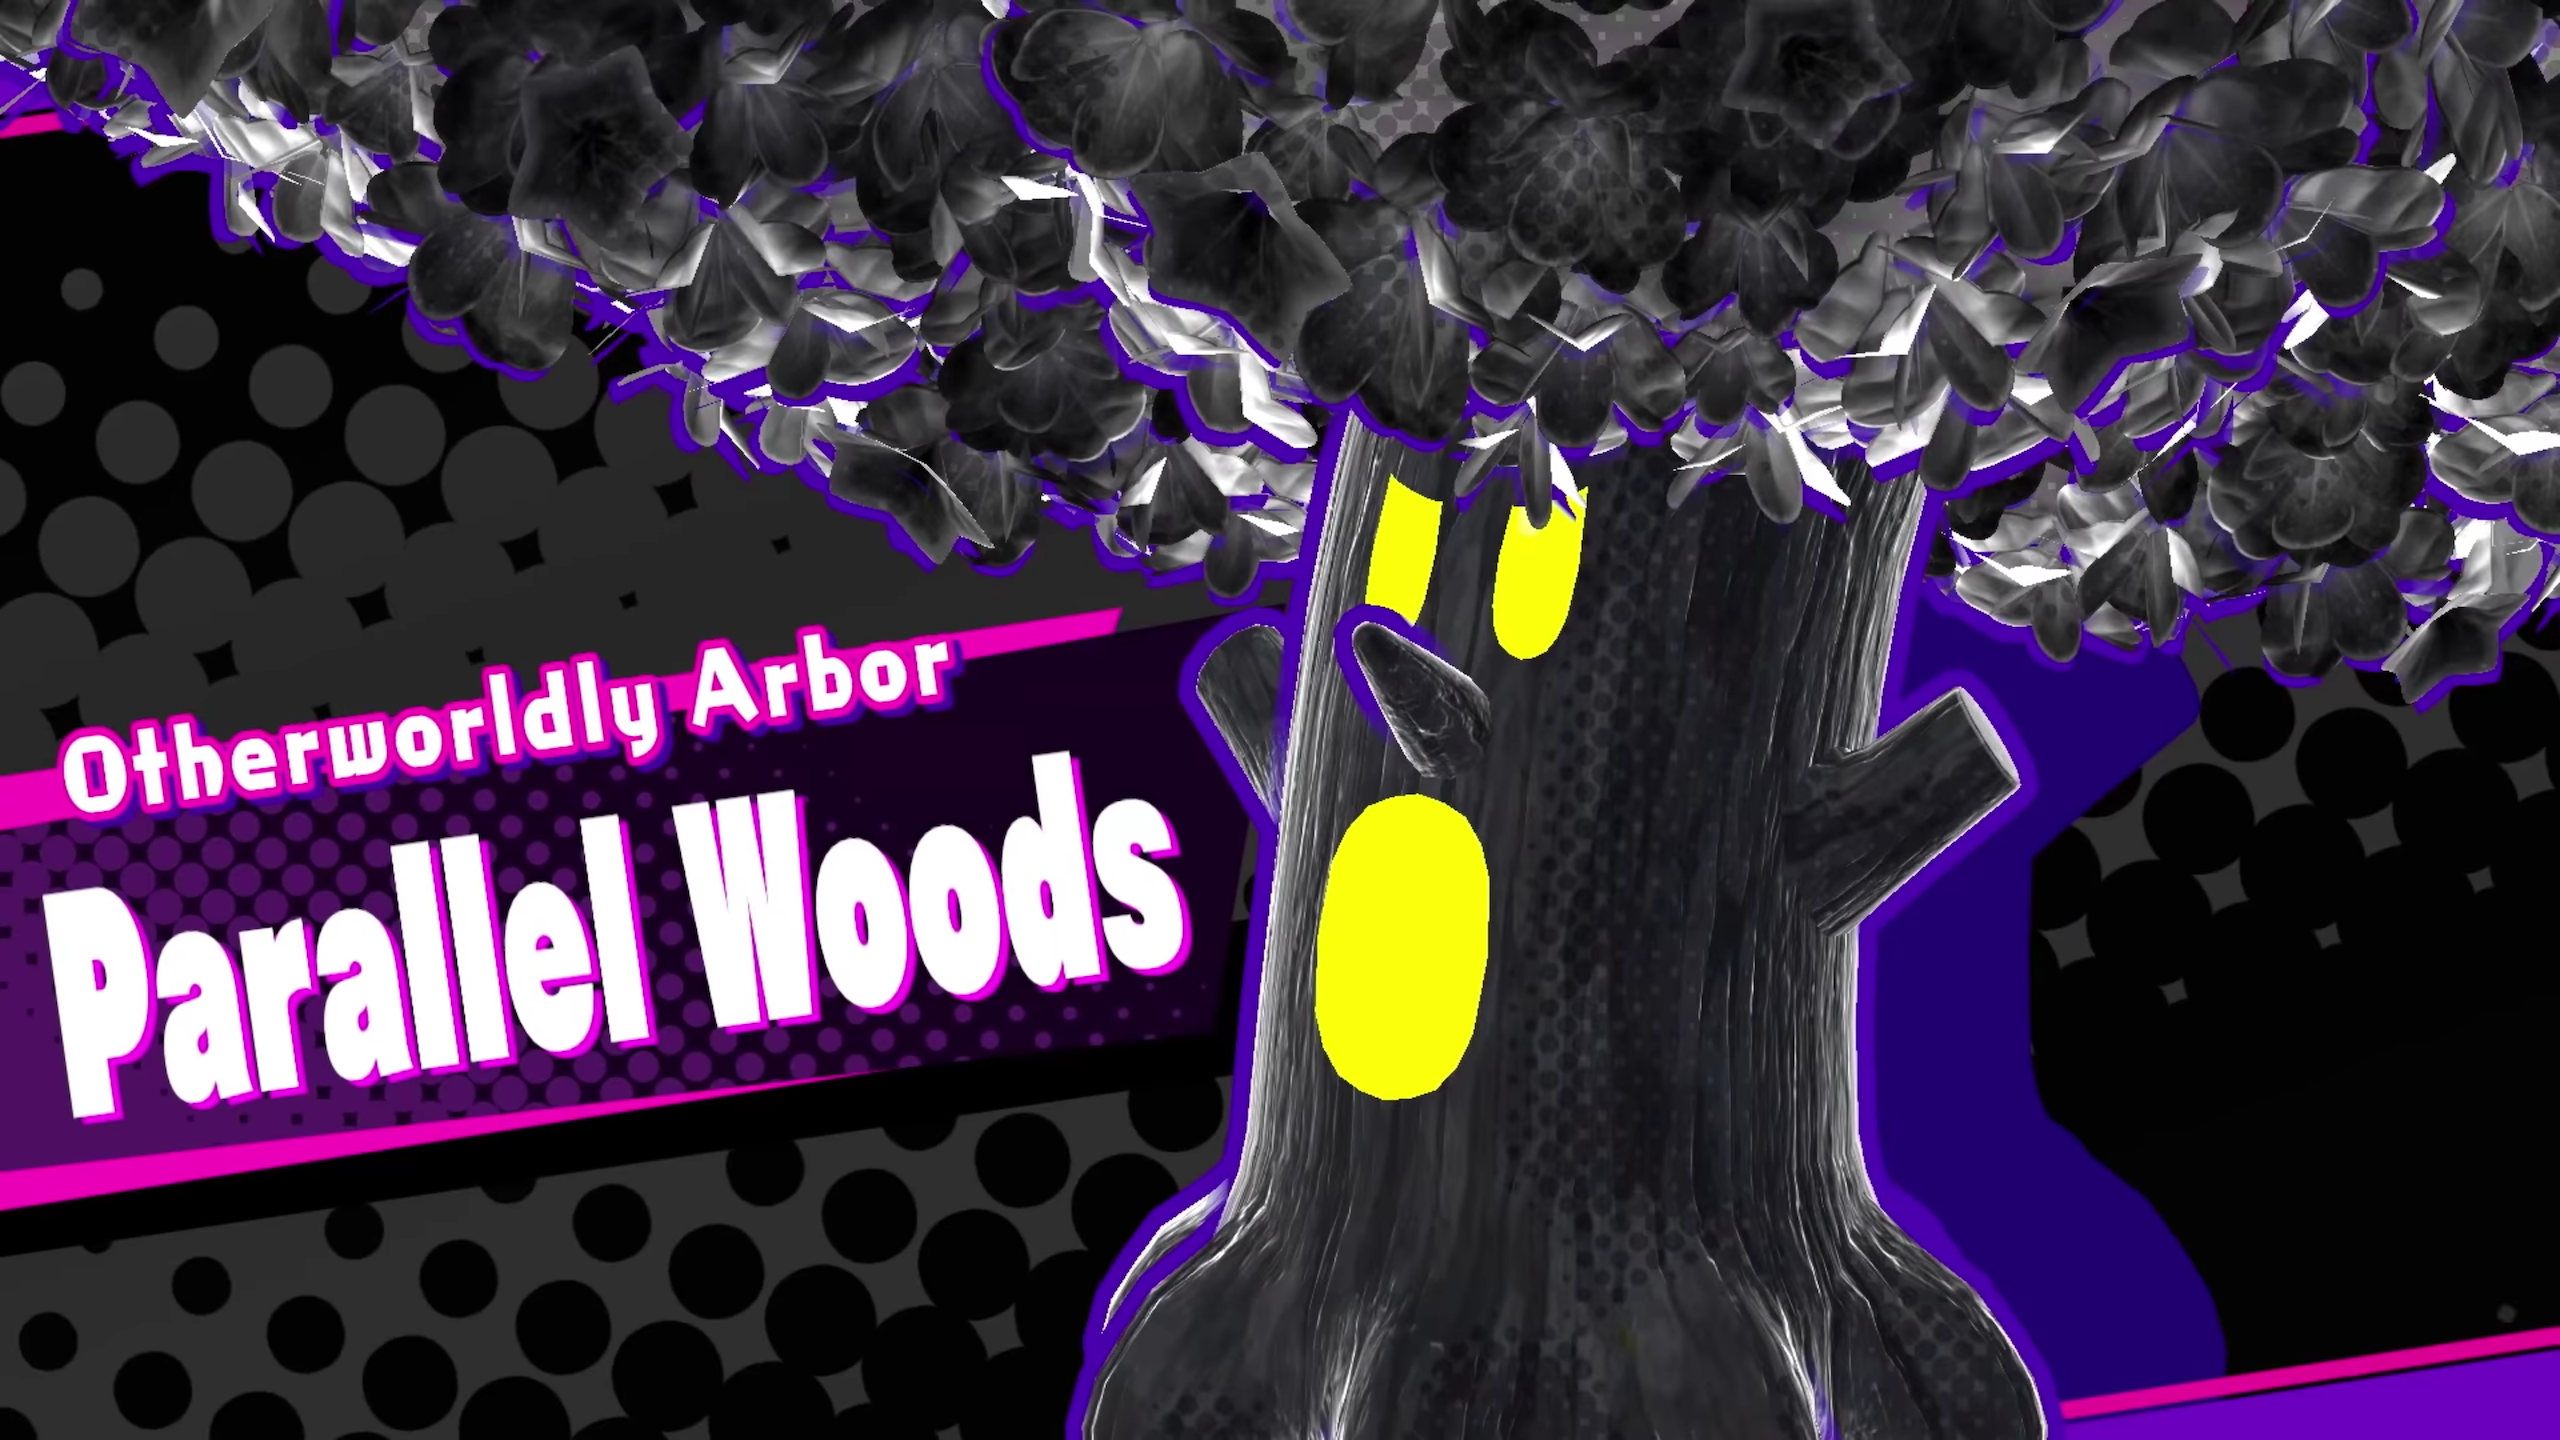 Parallel Woods